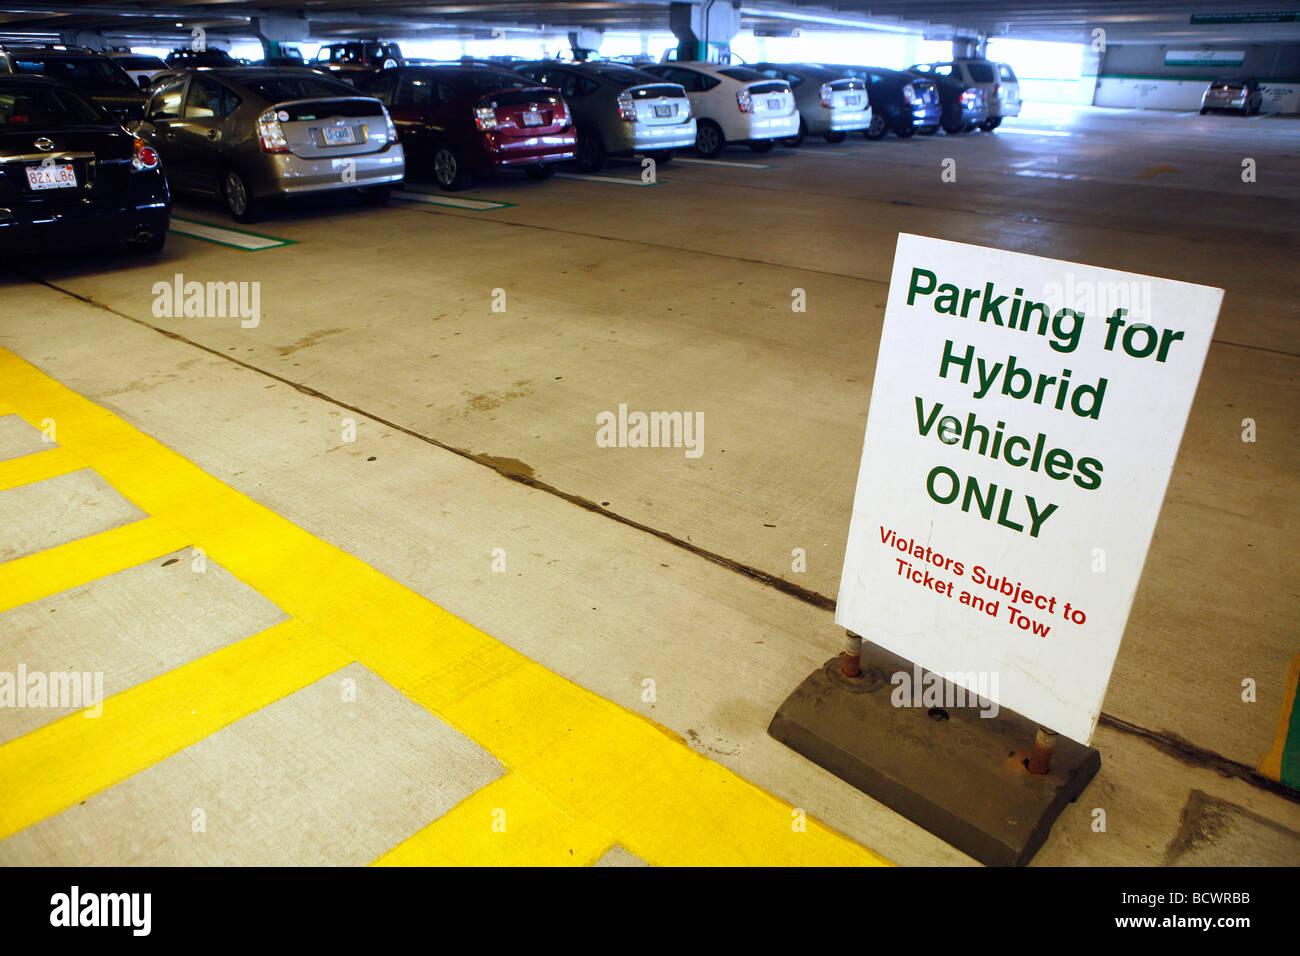 Privileged garage parking for hybrid cars, Boston - Stock Image